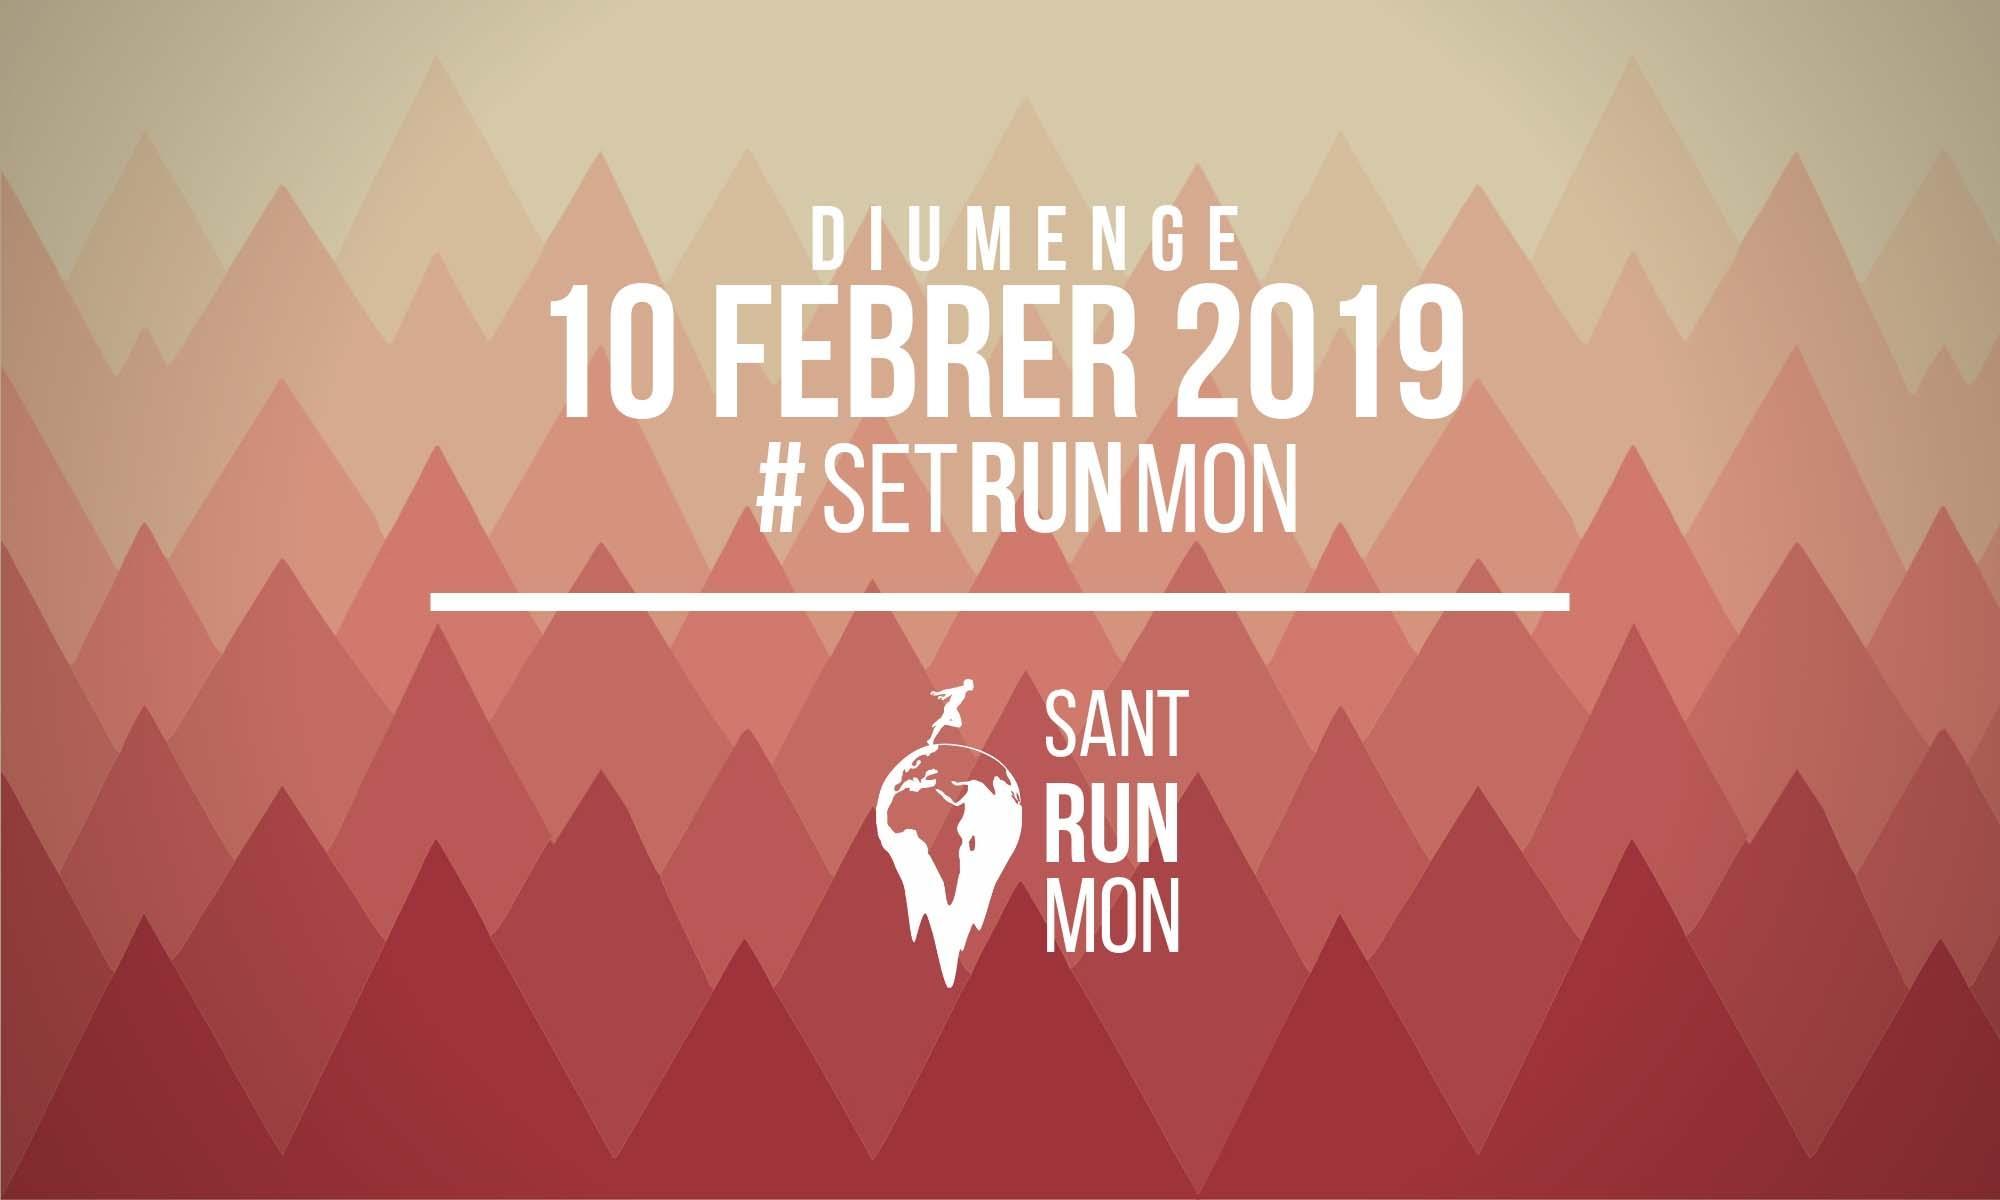 7a SantRunmon Trail de la Segarra